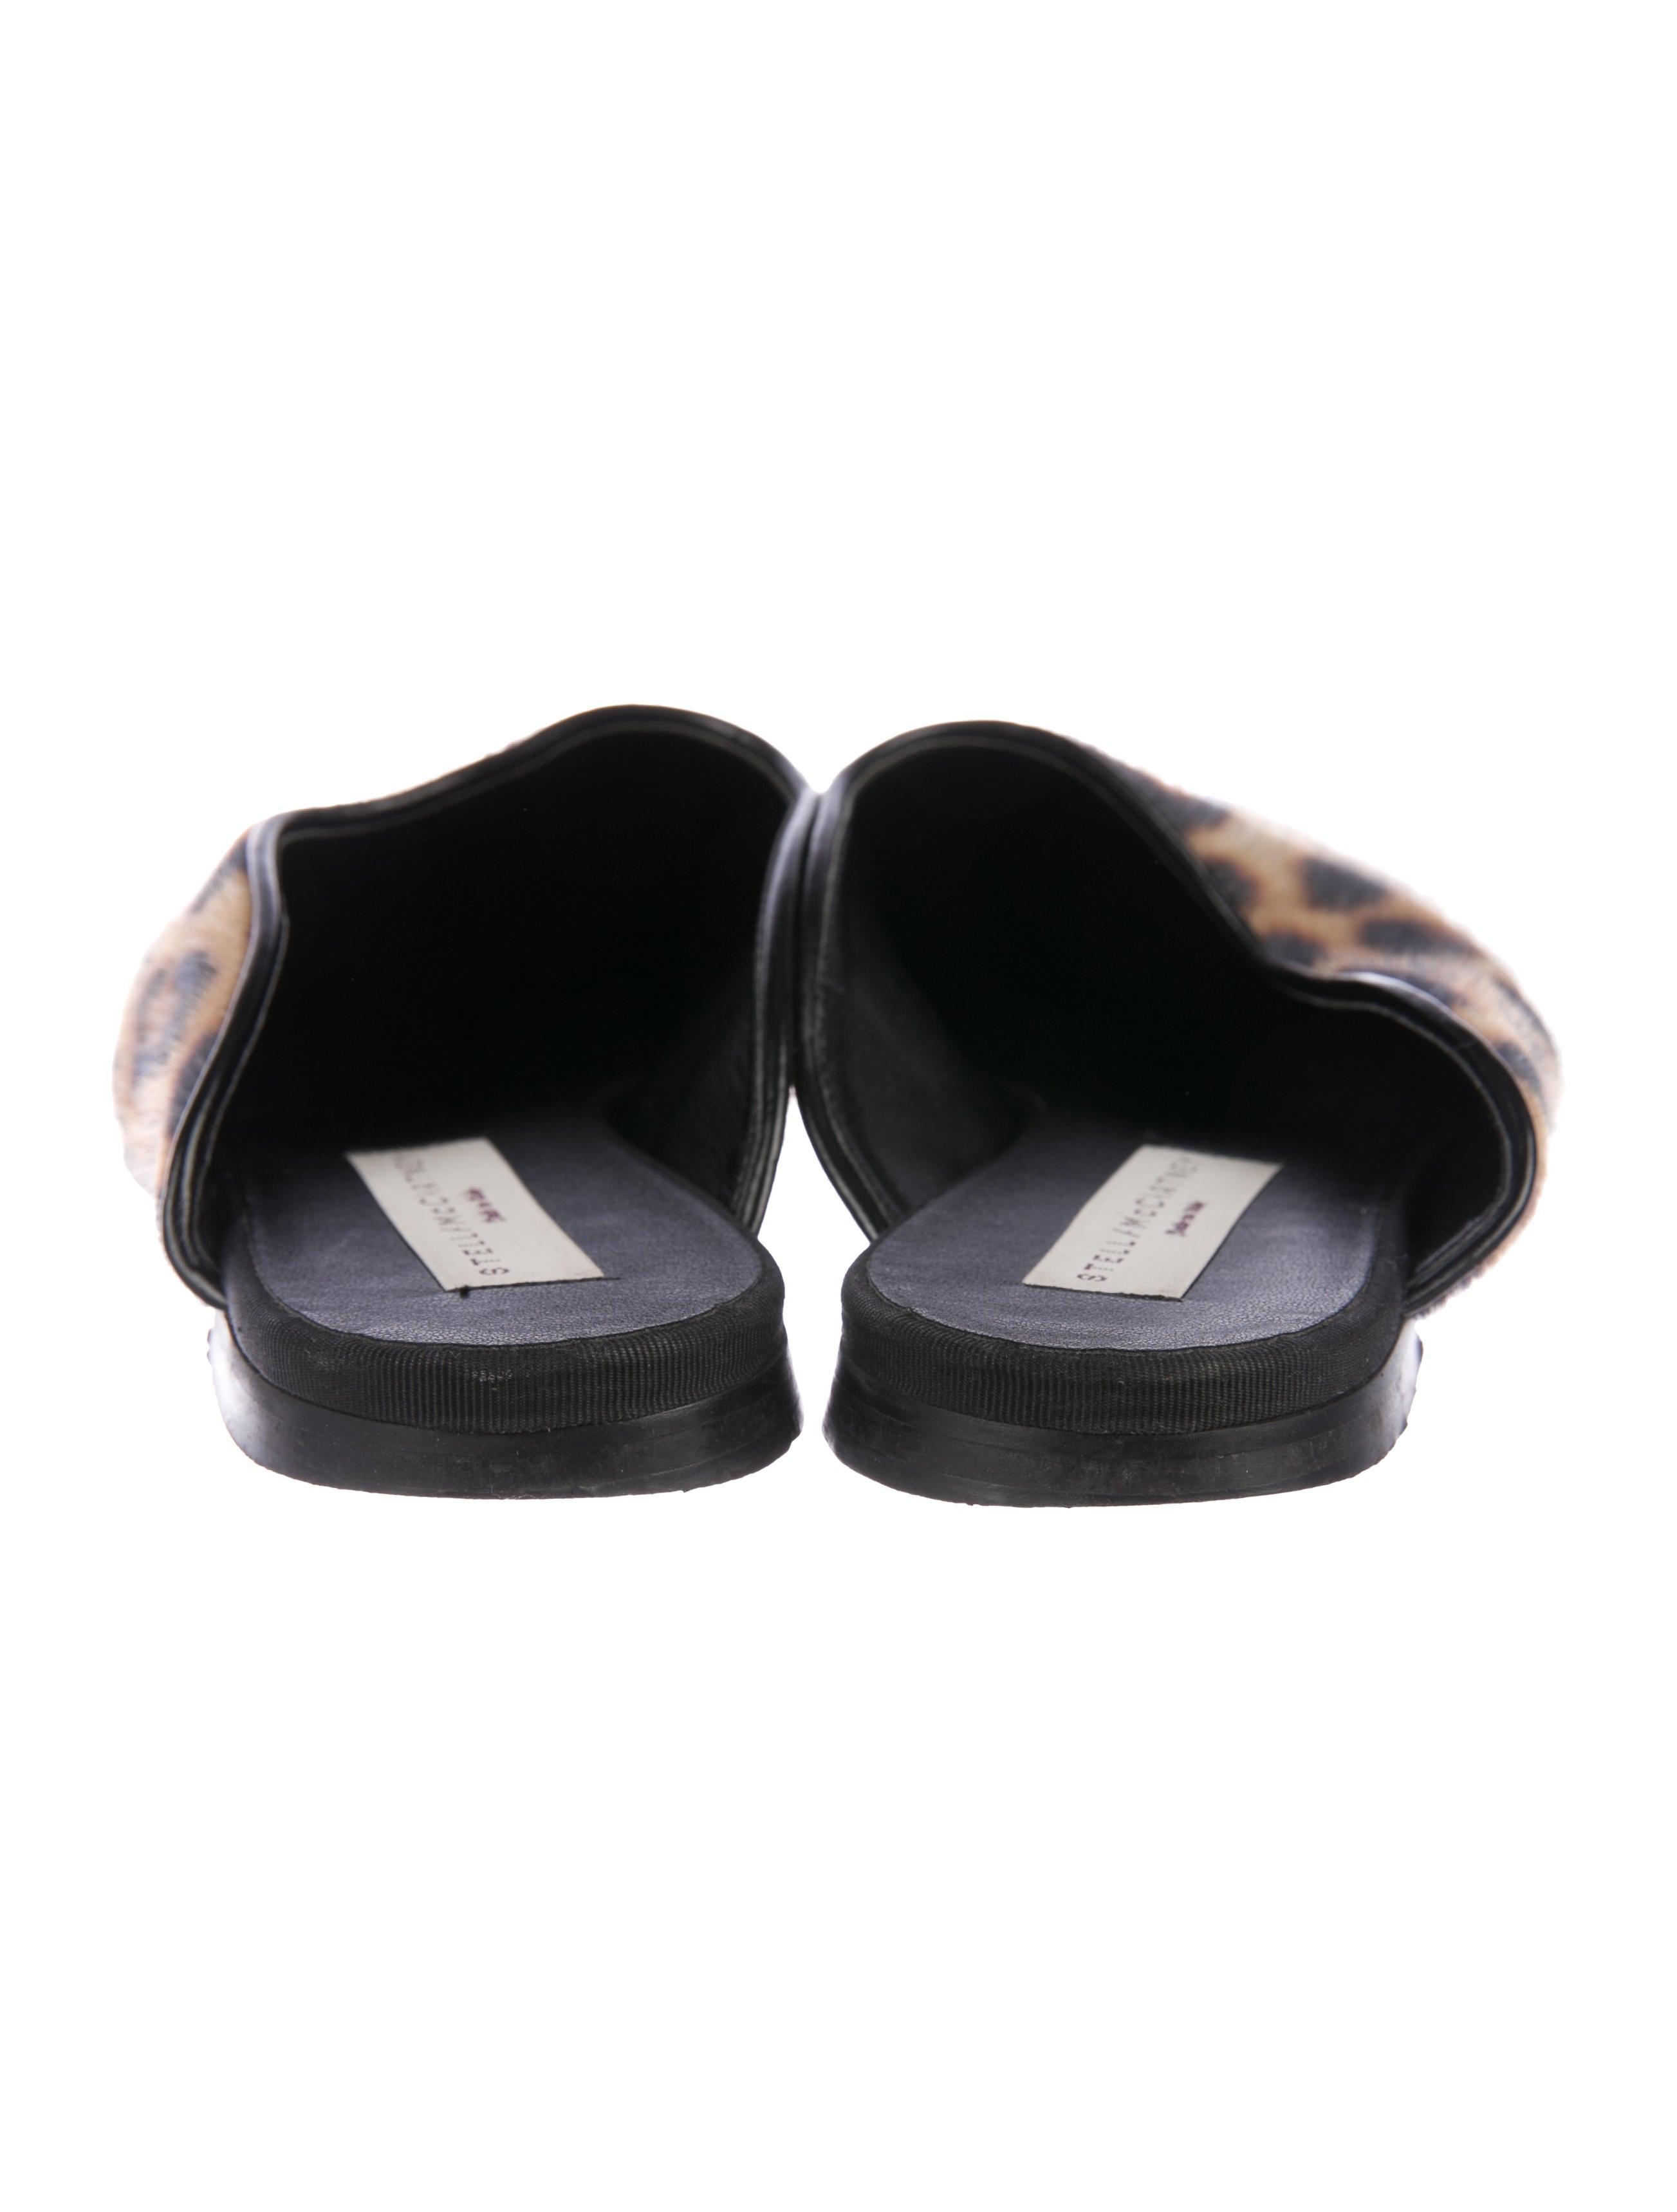 Stella McCartney Faux-Fur Square-Toe Mules outlet for cheap free shipping wiki hxBkWqFwVX